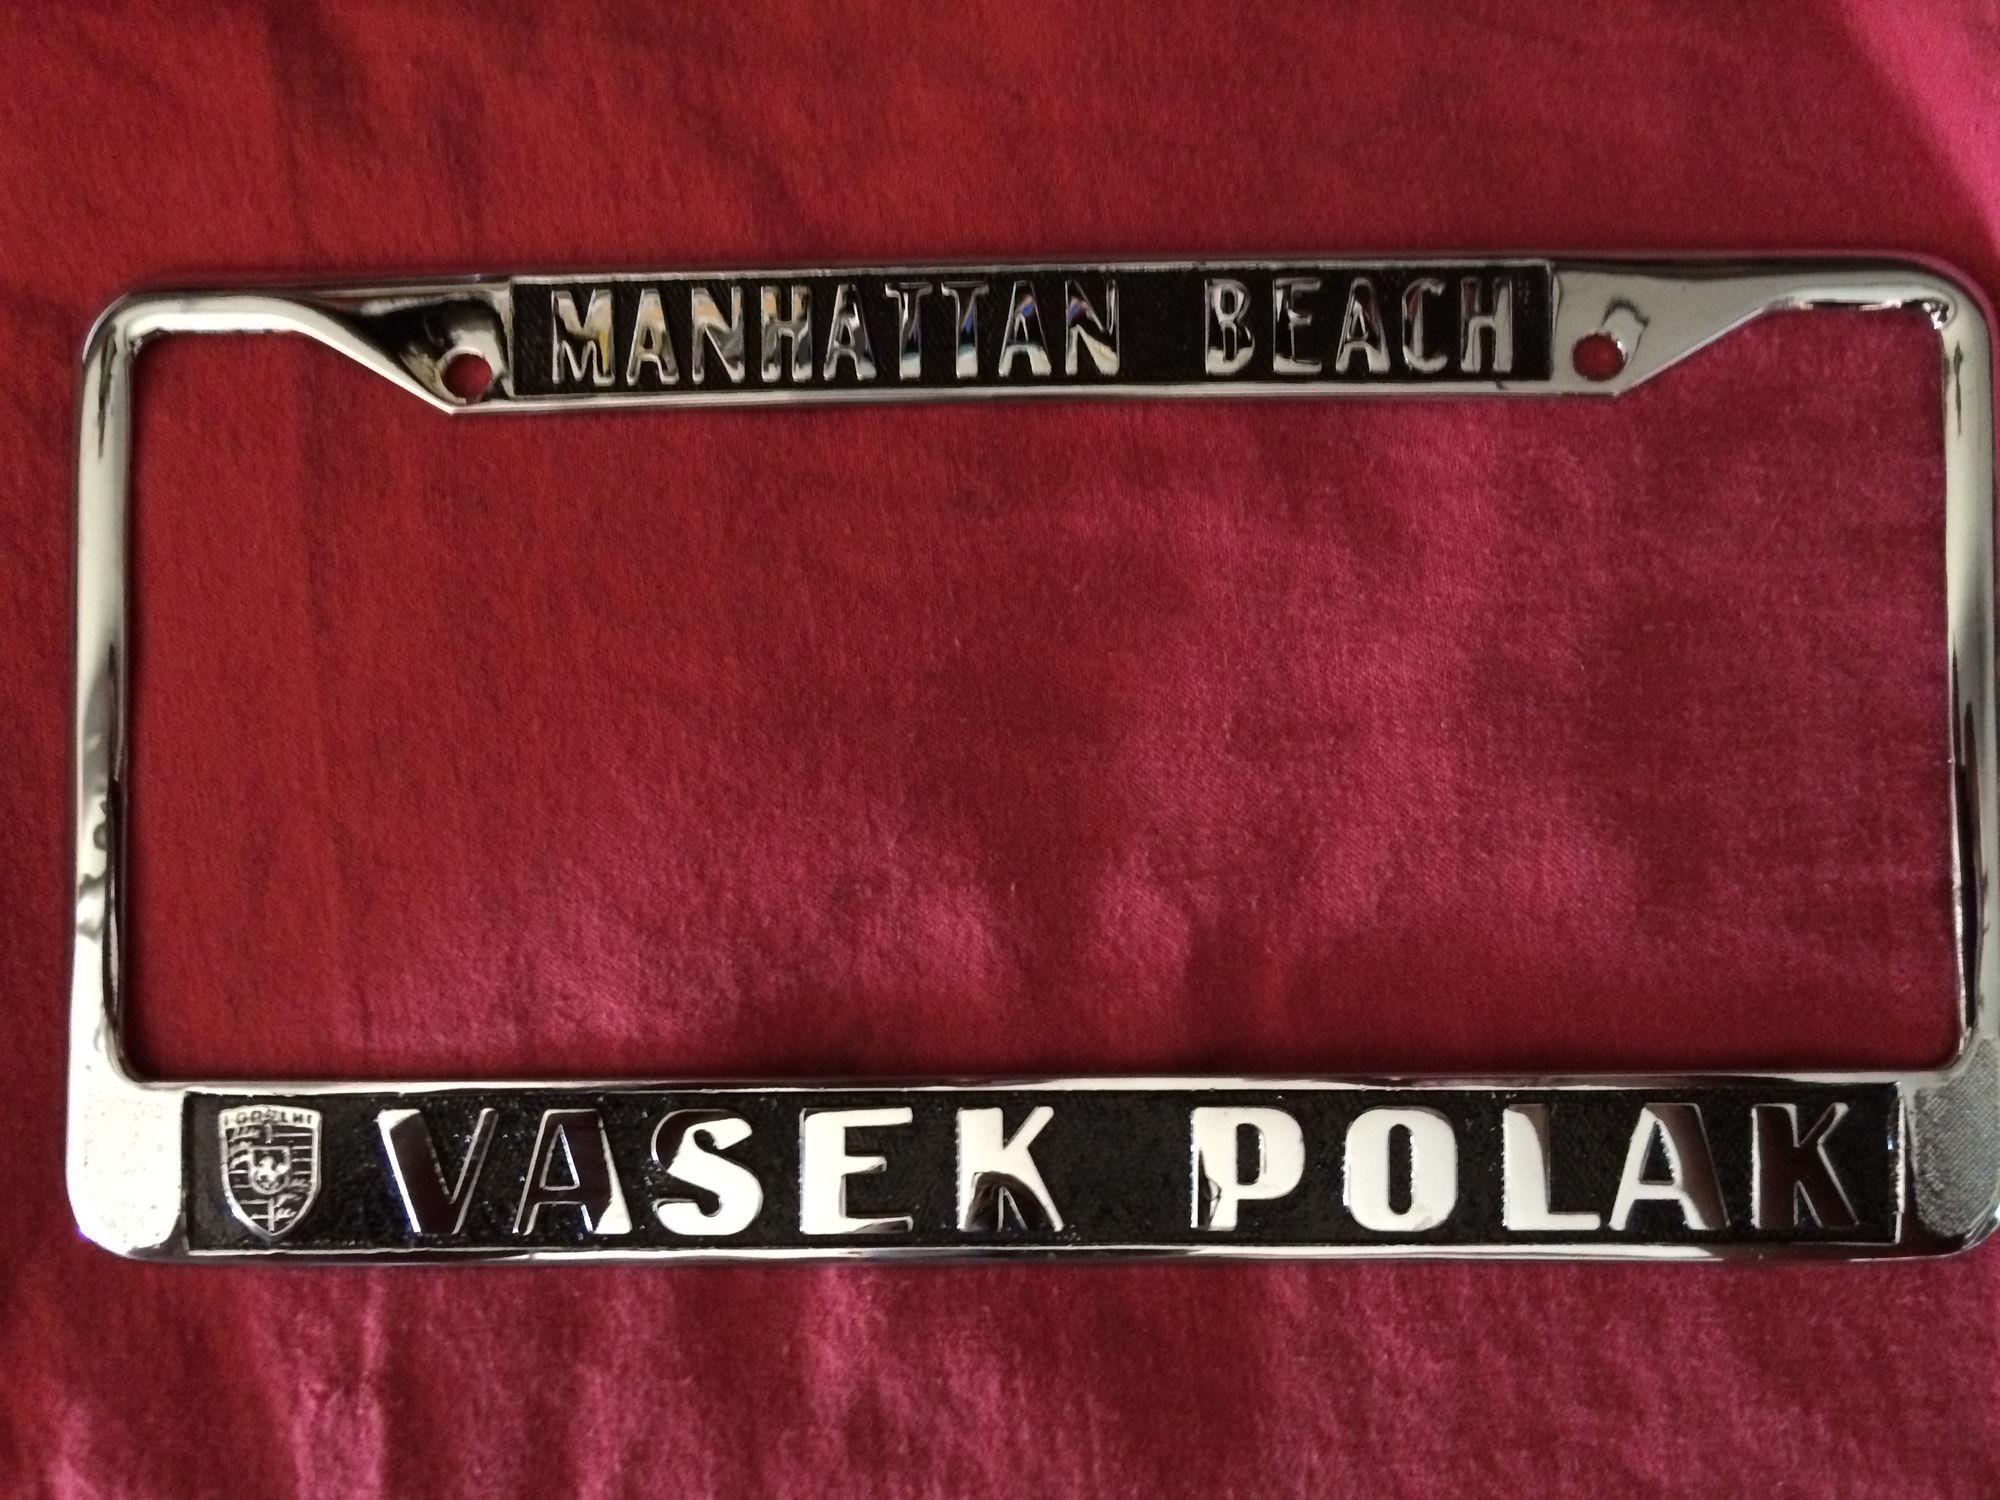 Vasek Polak License Plate Frames Rennlist Discussion Forums